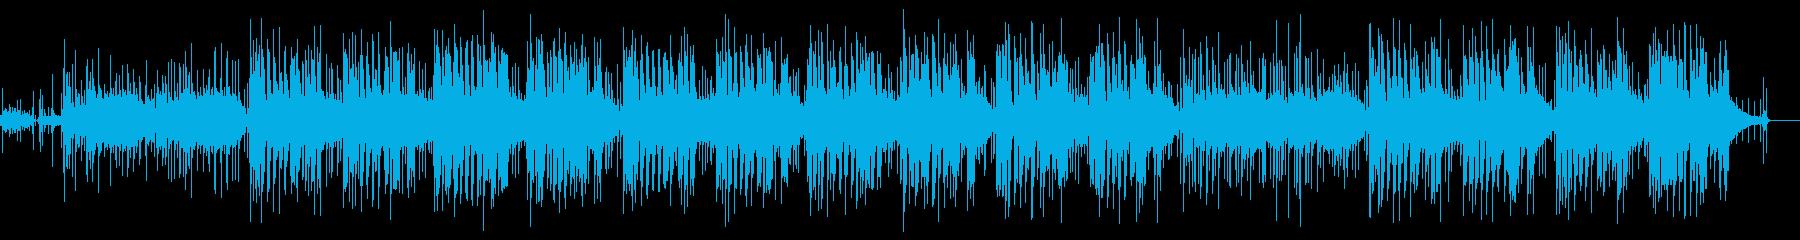 emma brownの再生済みの波形